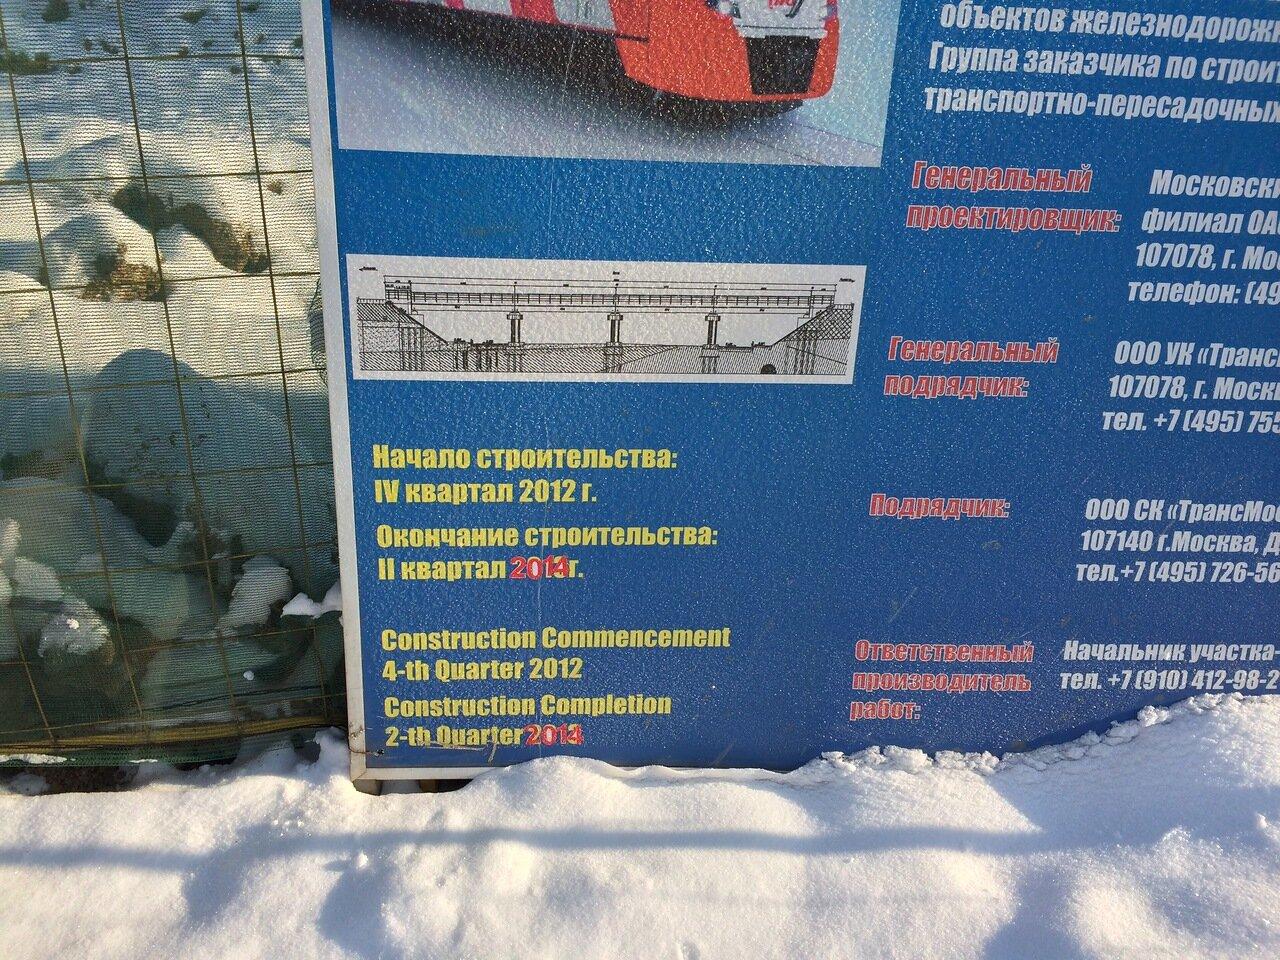 http://img-fotki.yandex.ru/get/9104/82260854.2dd/0_b7aaa_aa5cdb00_XXXL.jpg